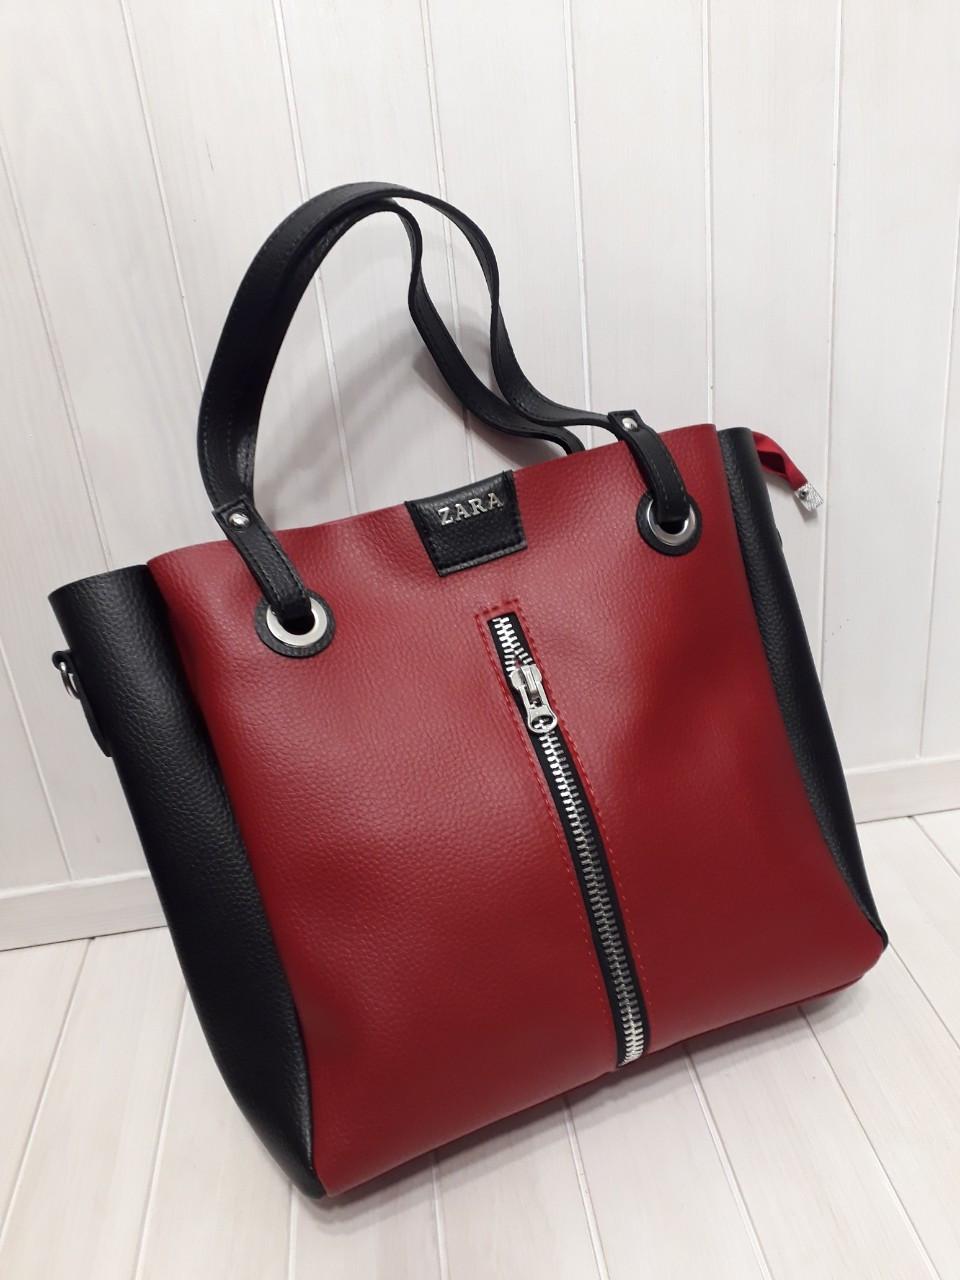 4133f5b3ab5a Модная женская сумка-тоут из кожзама 30*30 см, цена 426,80 грн ...